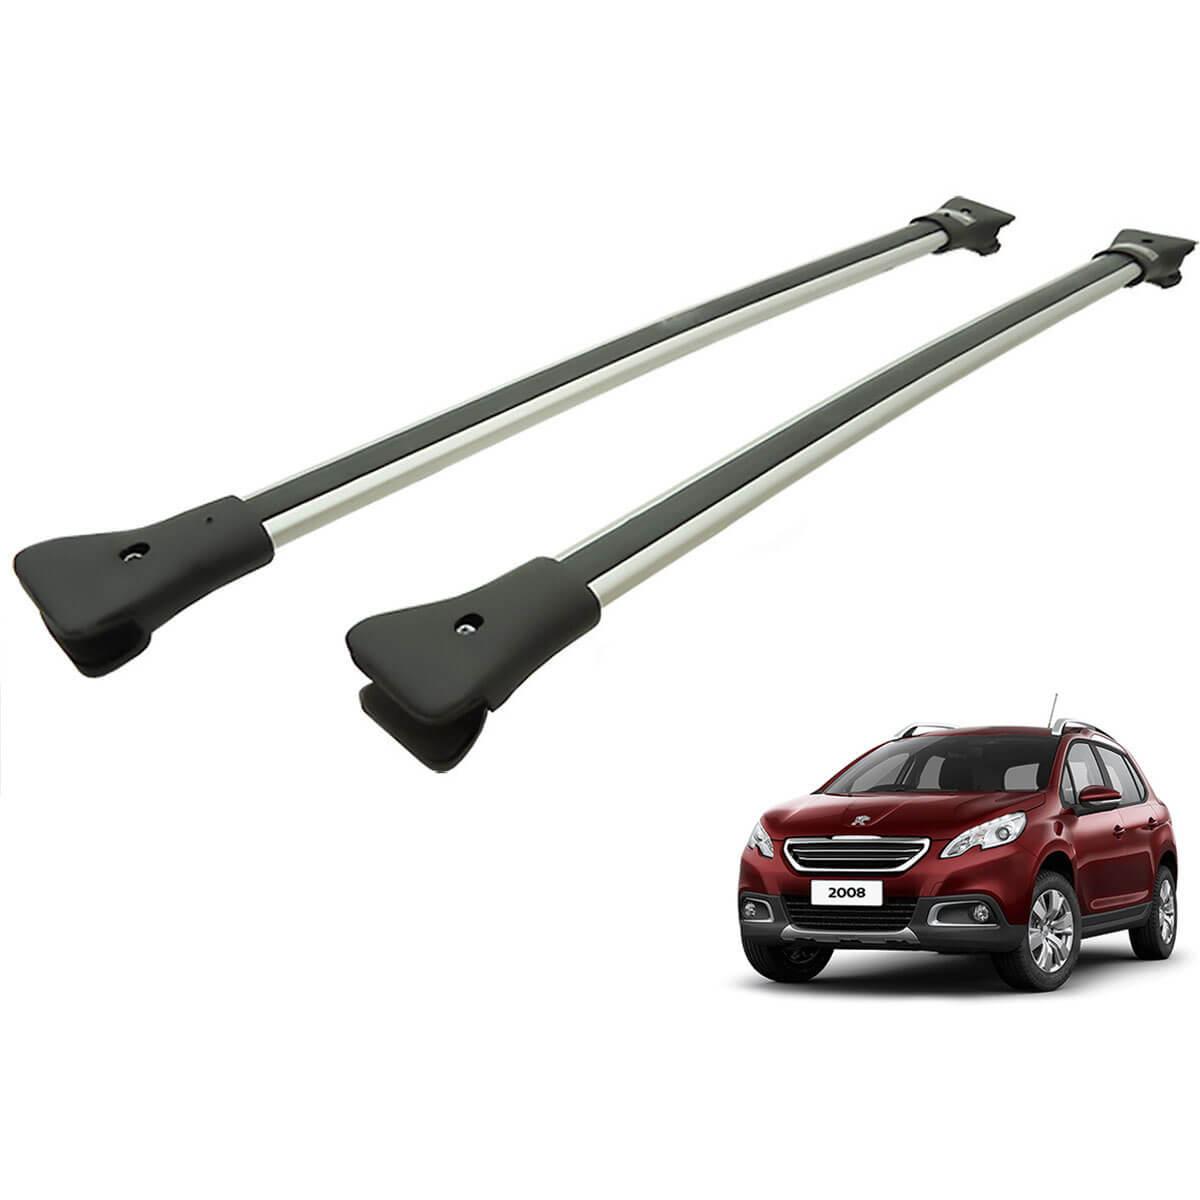 Travessa rack de teto larga alumínio Peugeot 2008 modelo 2016 a 2022